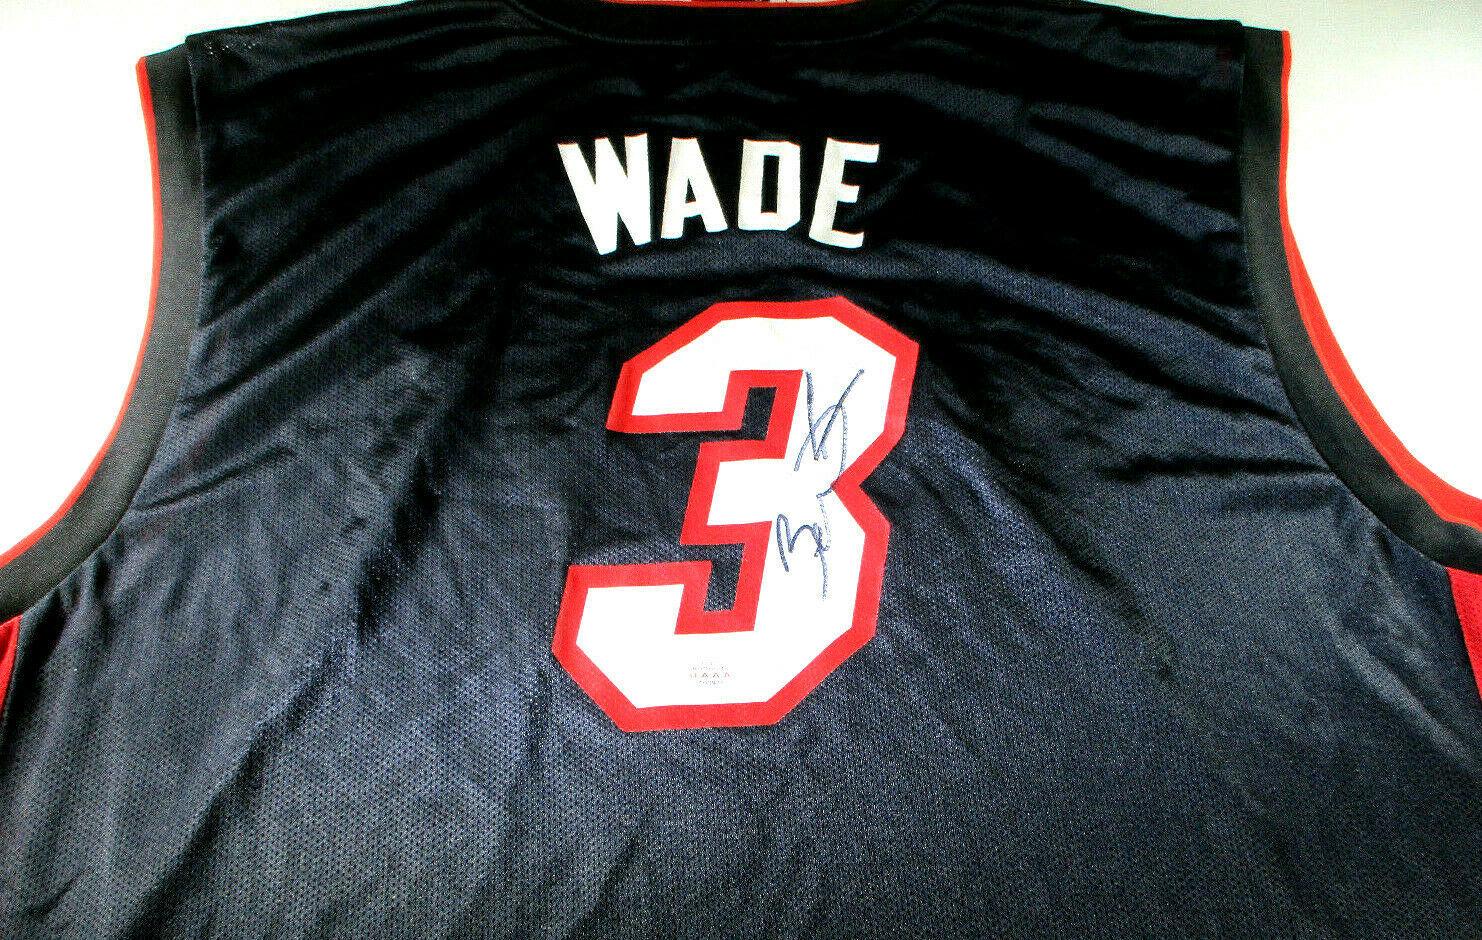 DWAYNE WADE / AUTOGRAPHED MIAMI HEAT BLACK PRO STYLE BASKETBALL JERSEY / COA